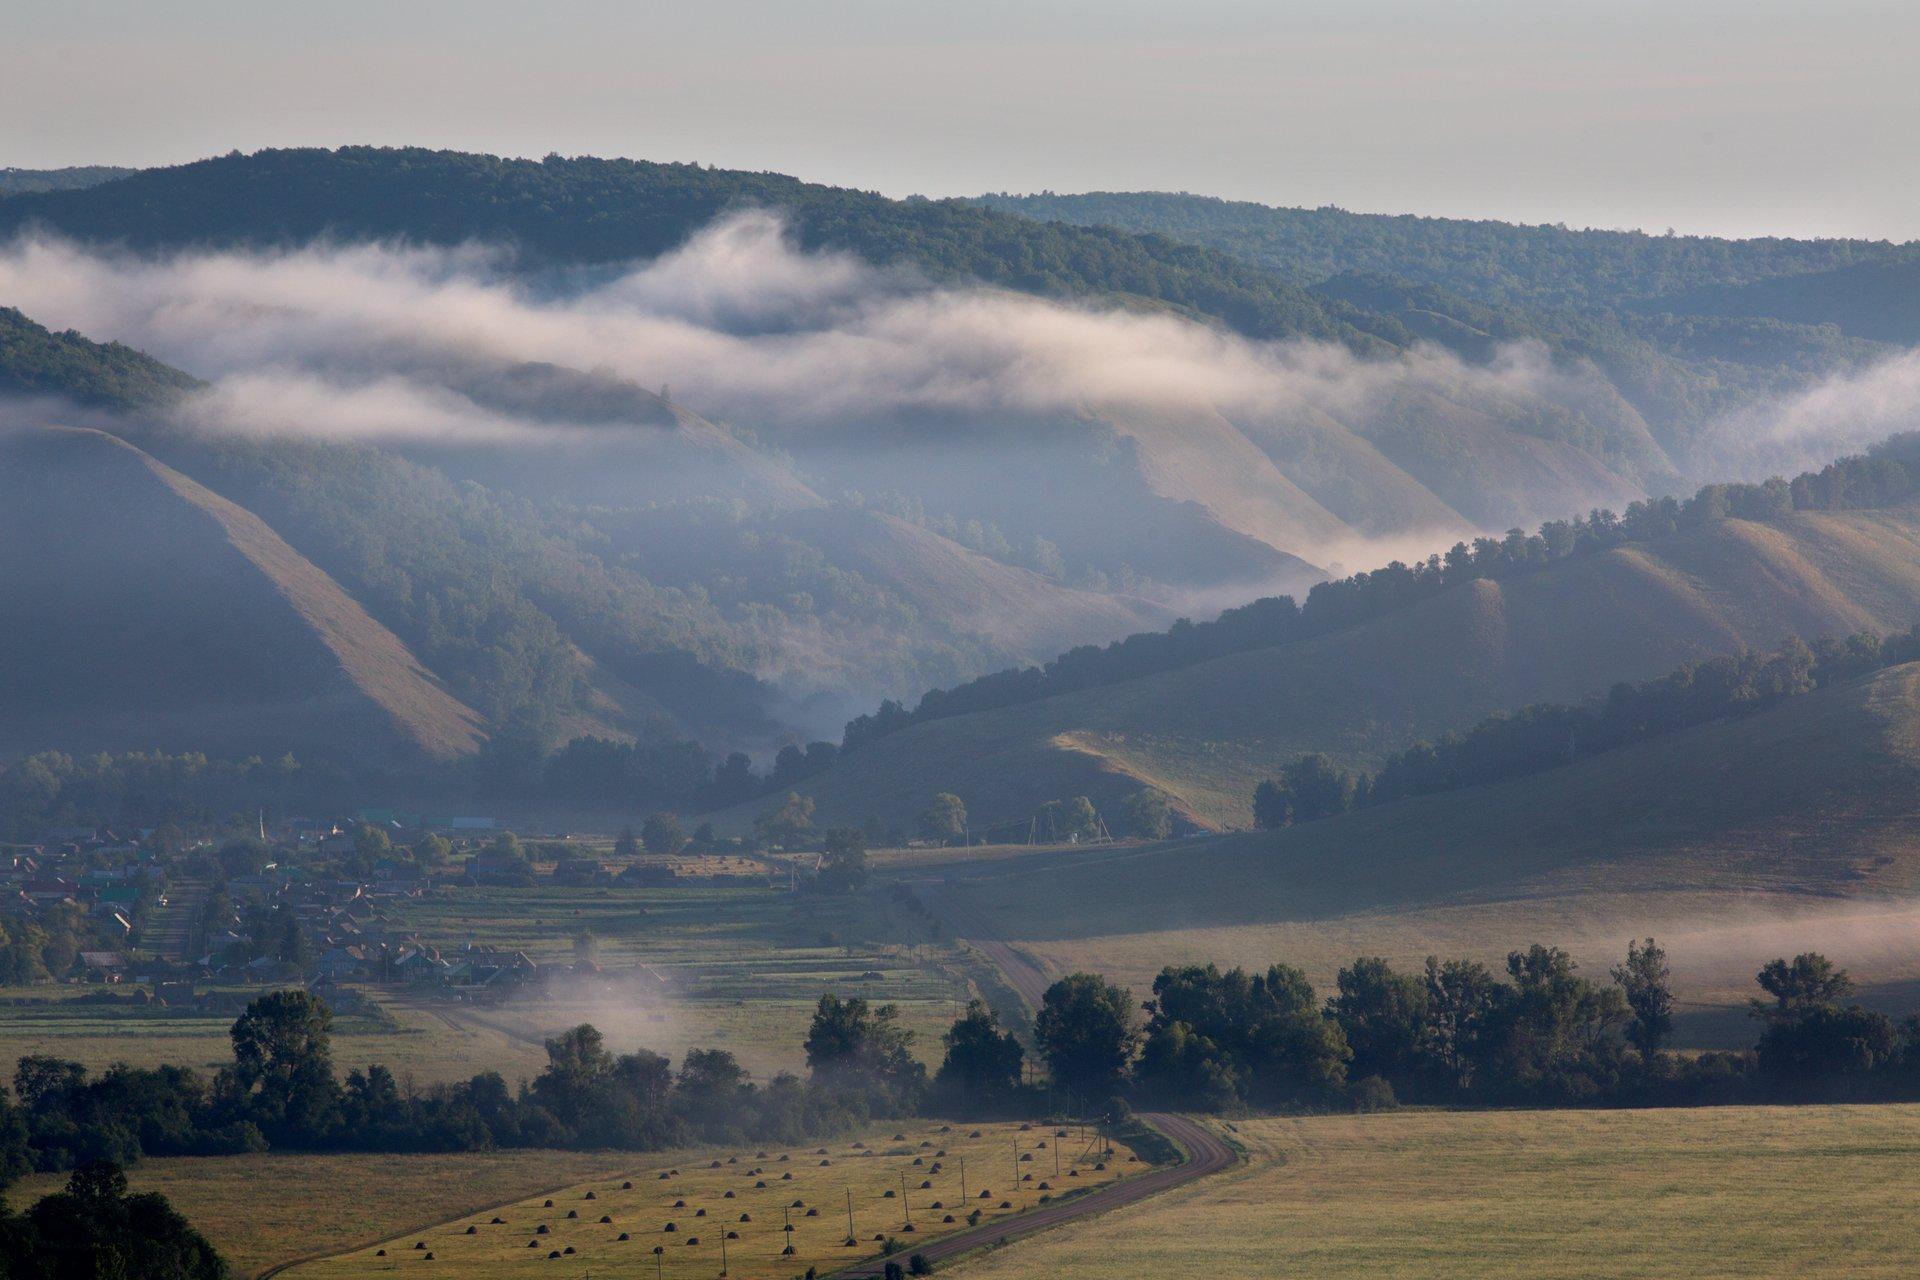 пейзаж, горы,  туман, утро, урал, южныйурал, природа, олег_грачёв,, Грачёв Олег